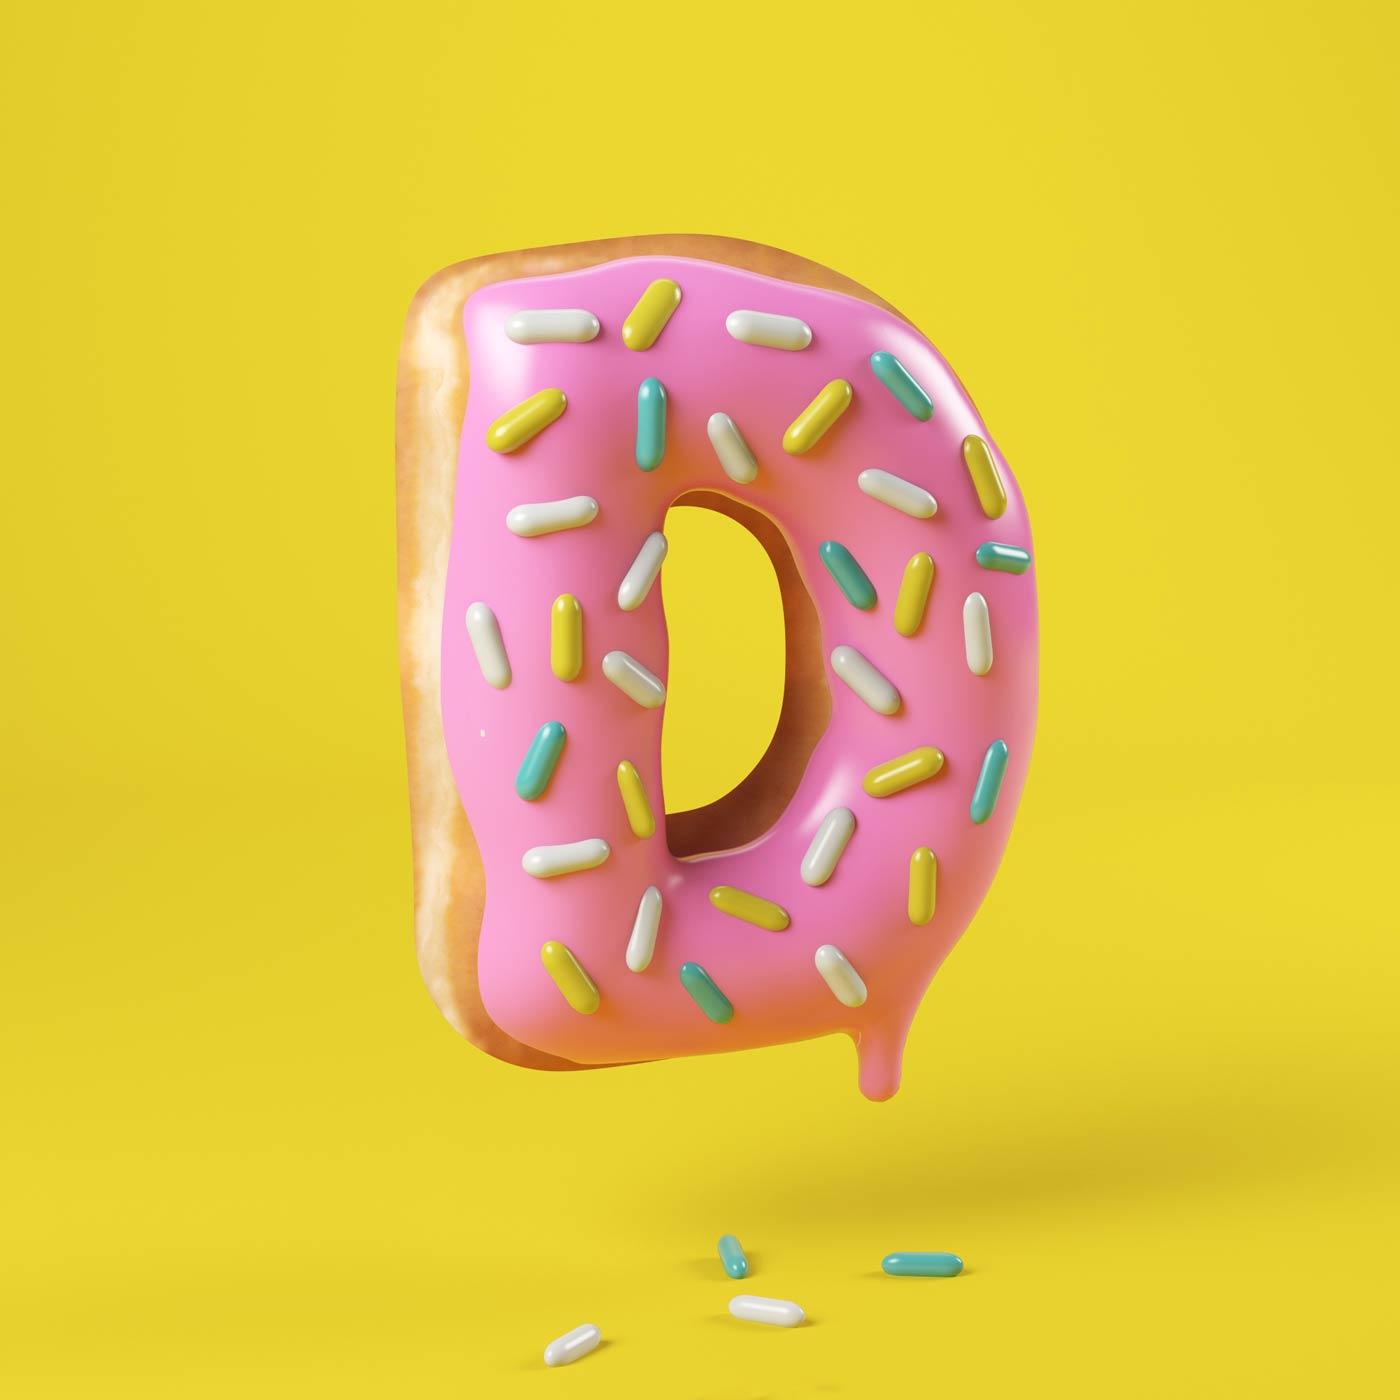 FOOD 3DFOOD FOODALPHABET CESS 3D 3DTYPE LETTERING CGI 3DARTIST DONUT